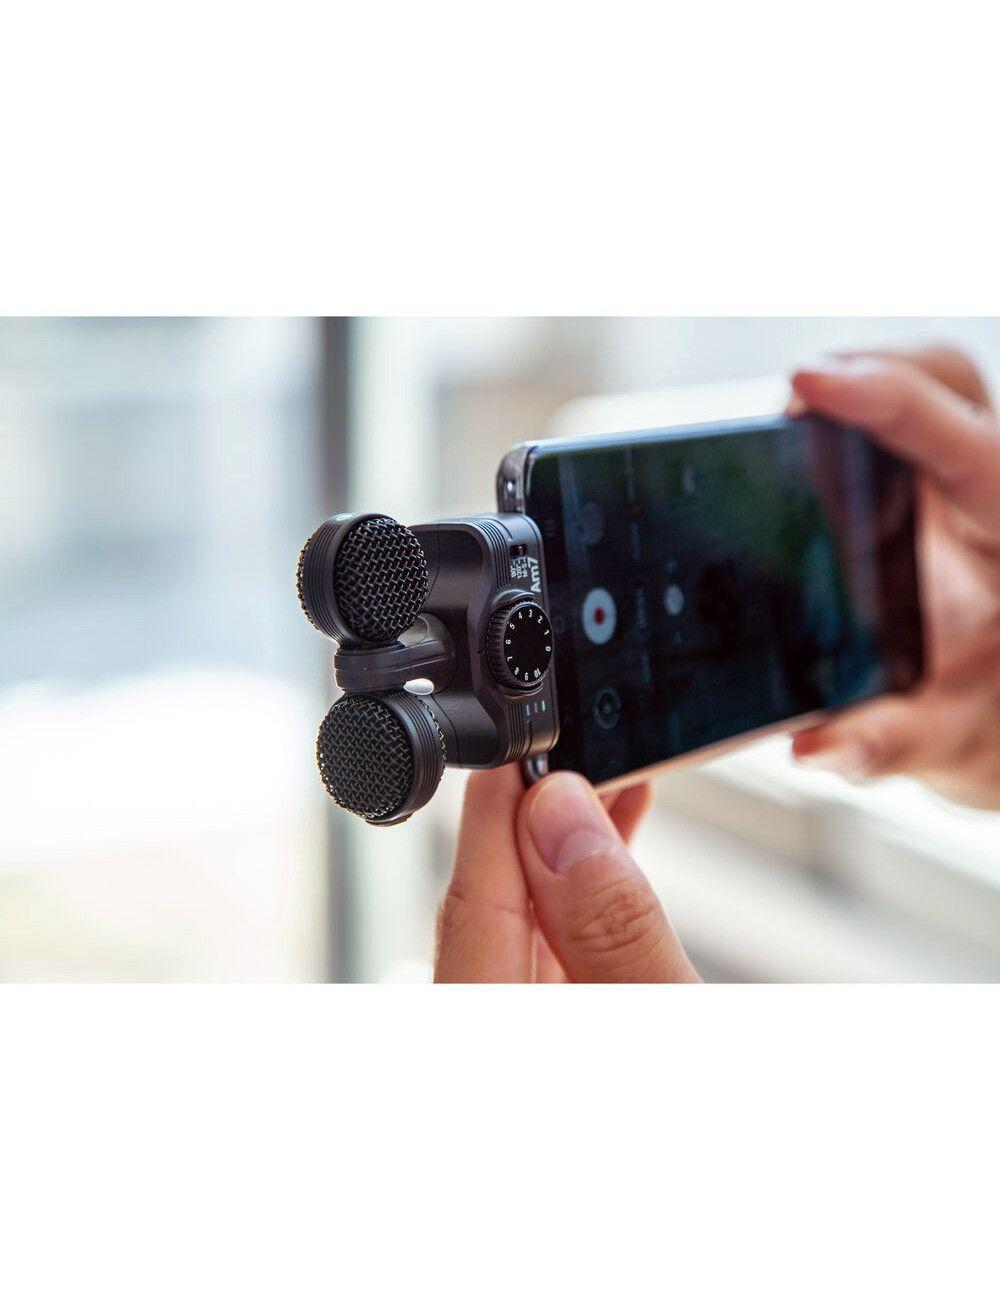 Lente Sigma para Canon 150-600mm CONTEMPORARY F5-6.3 DG OS HSM Super Teleobjetivo Liviano